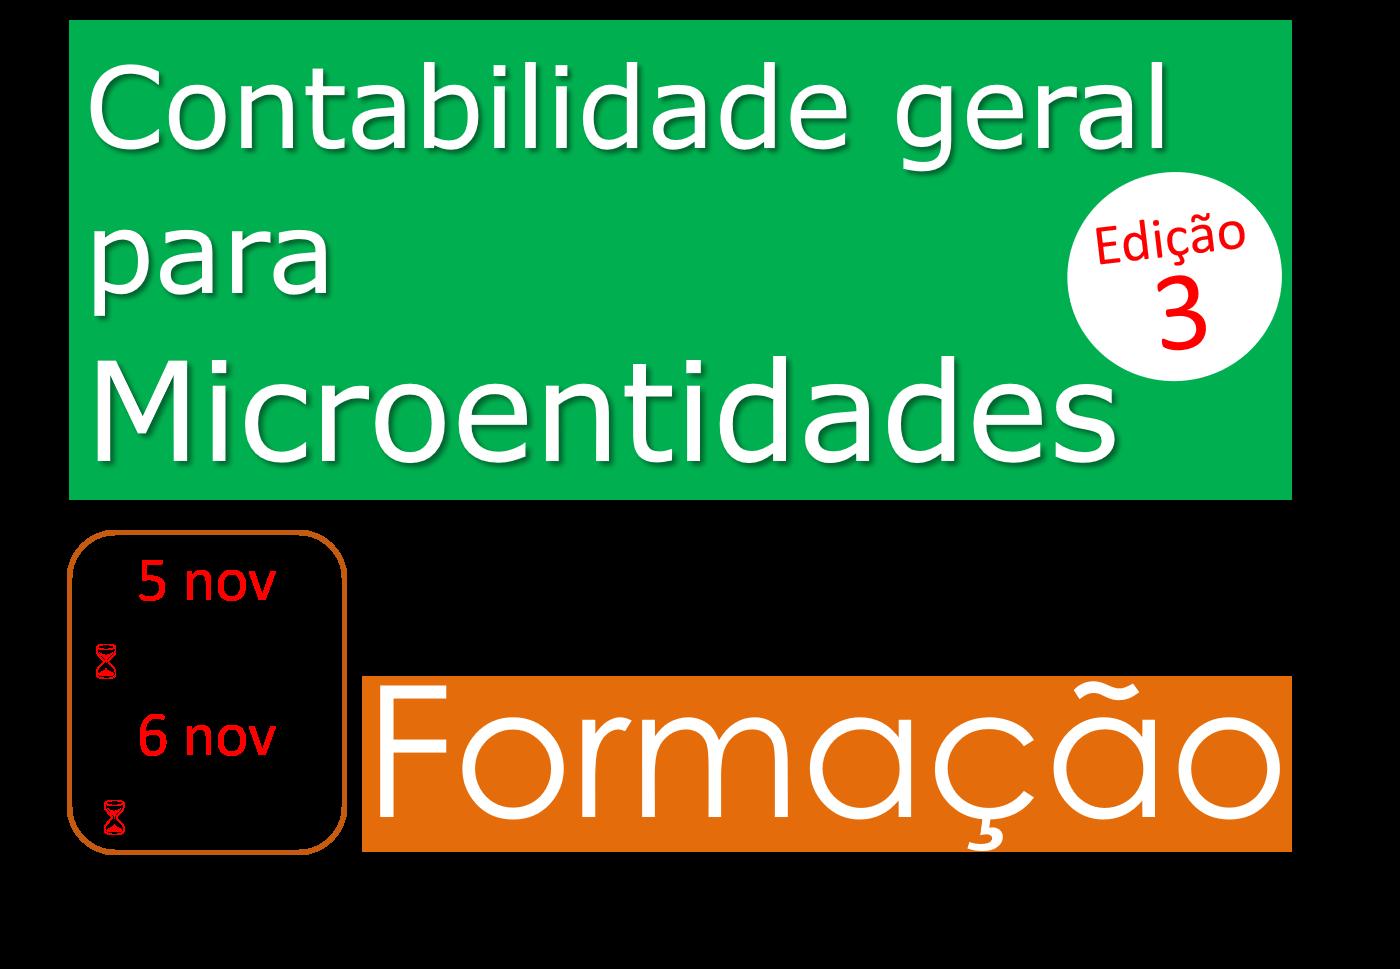 Contabilidade geral para Microentidades – 5 e 6/nov